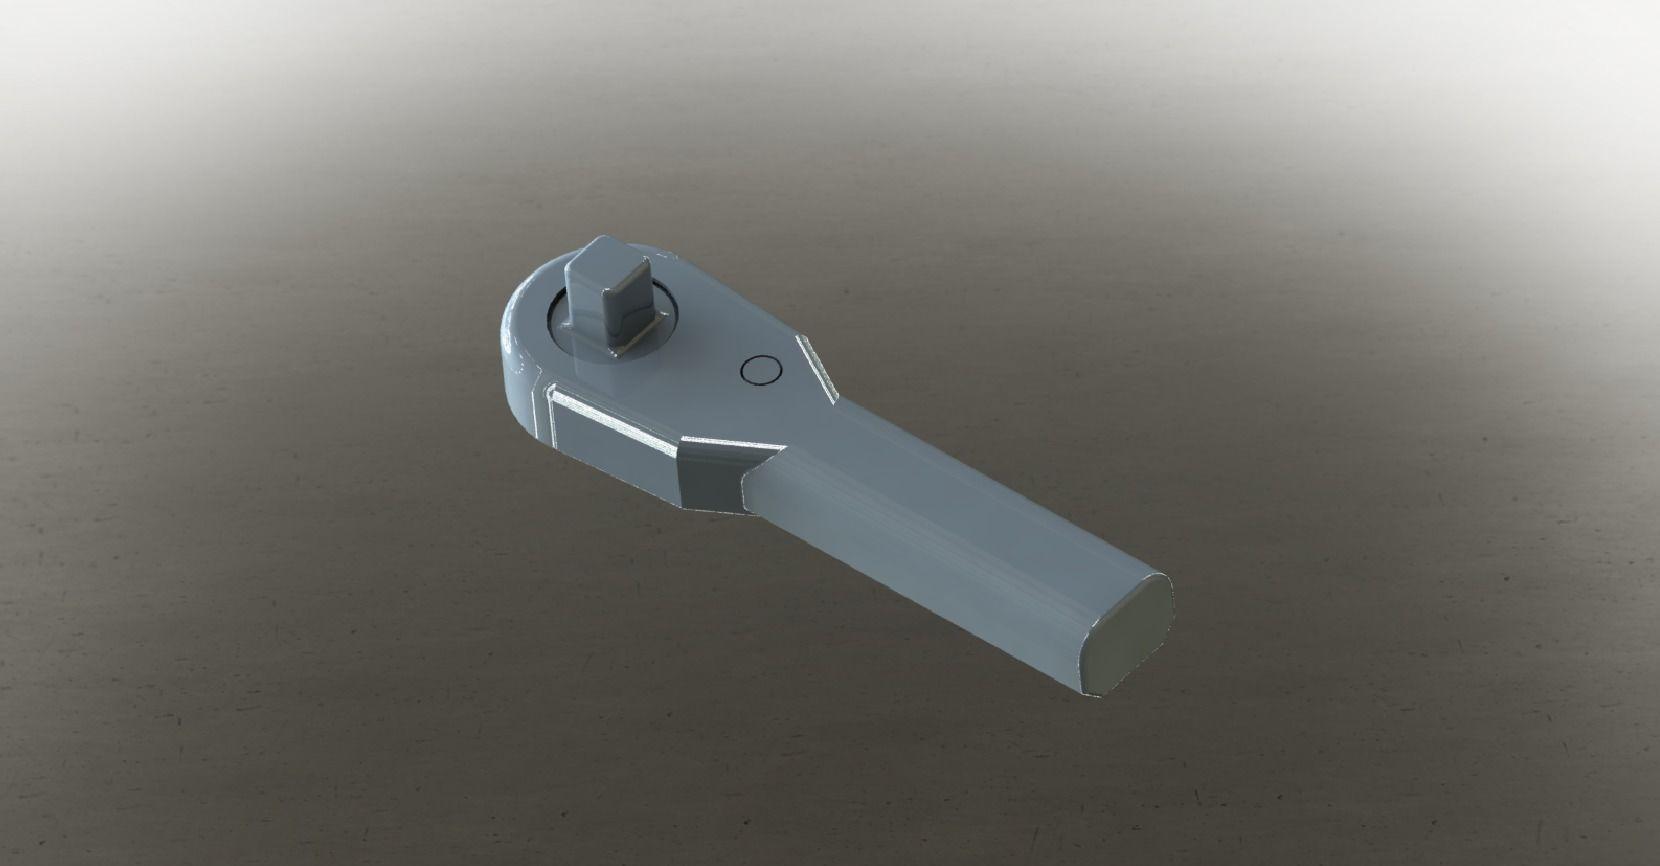 Nasa Torgue Wrench